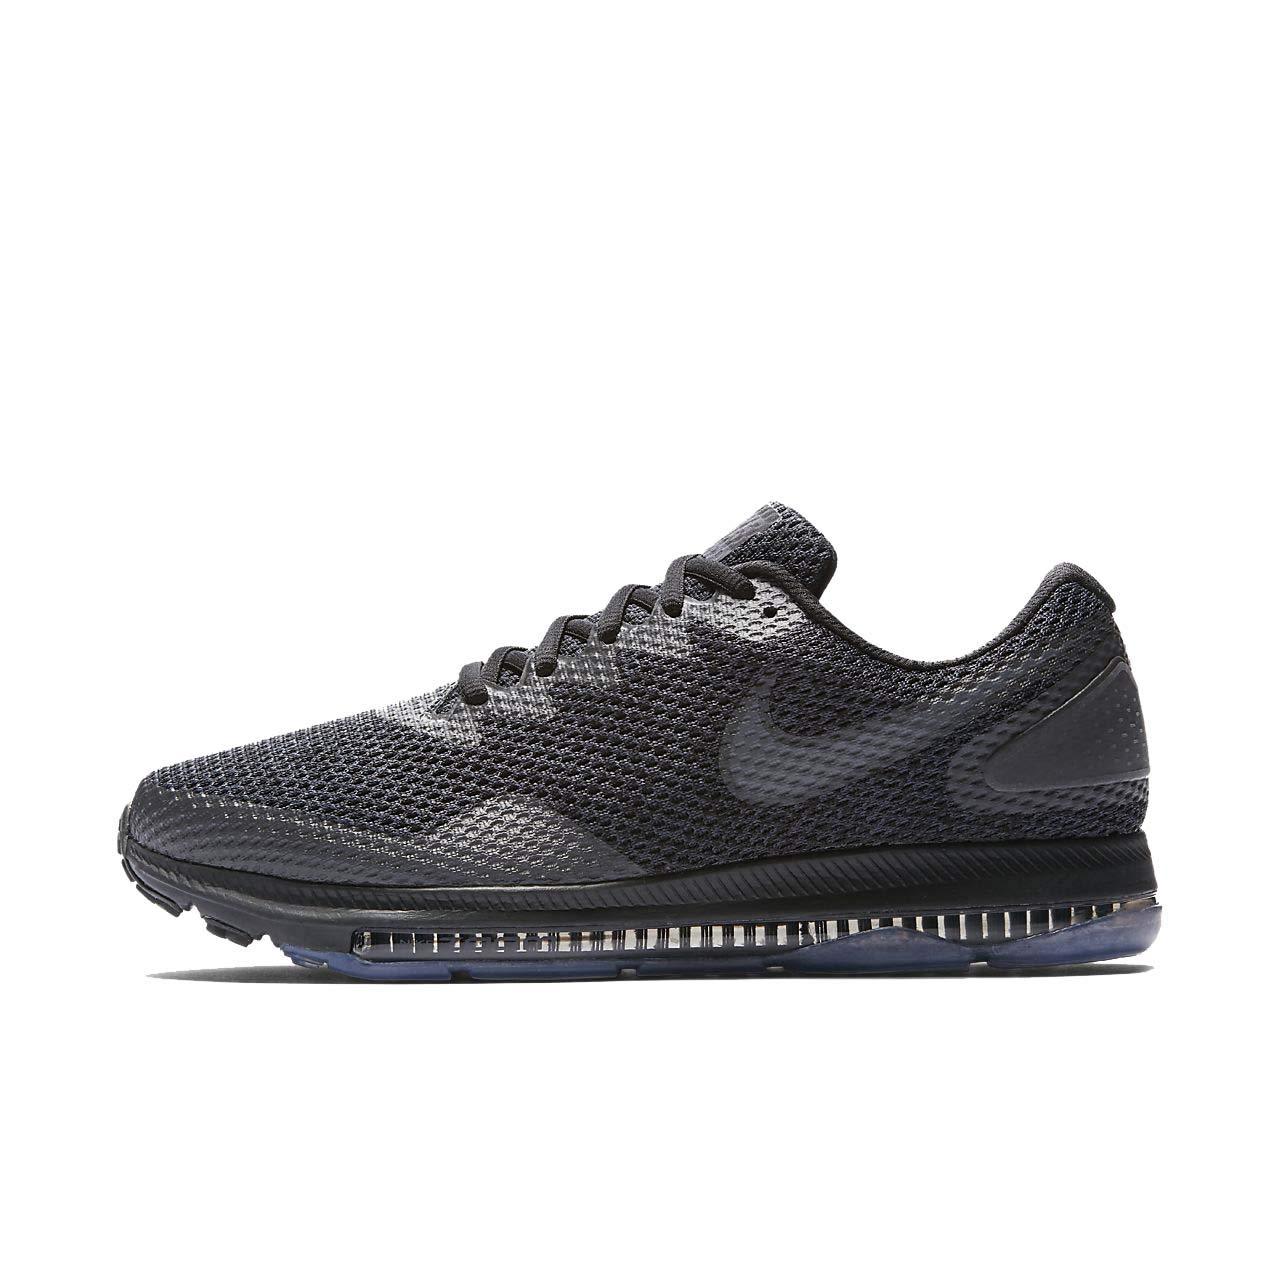 Black Dark Grey-anthracite Nike Men's Zoom All Out Low, OBISIDIAN Paramount bluee-Black